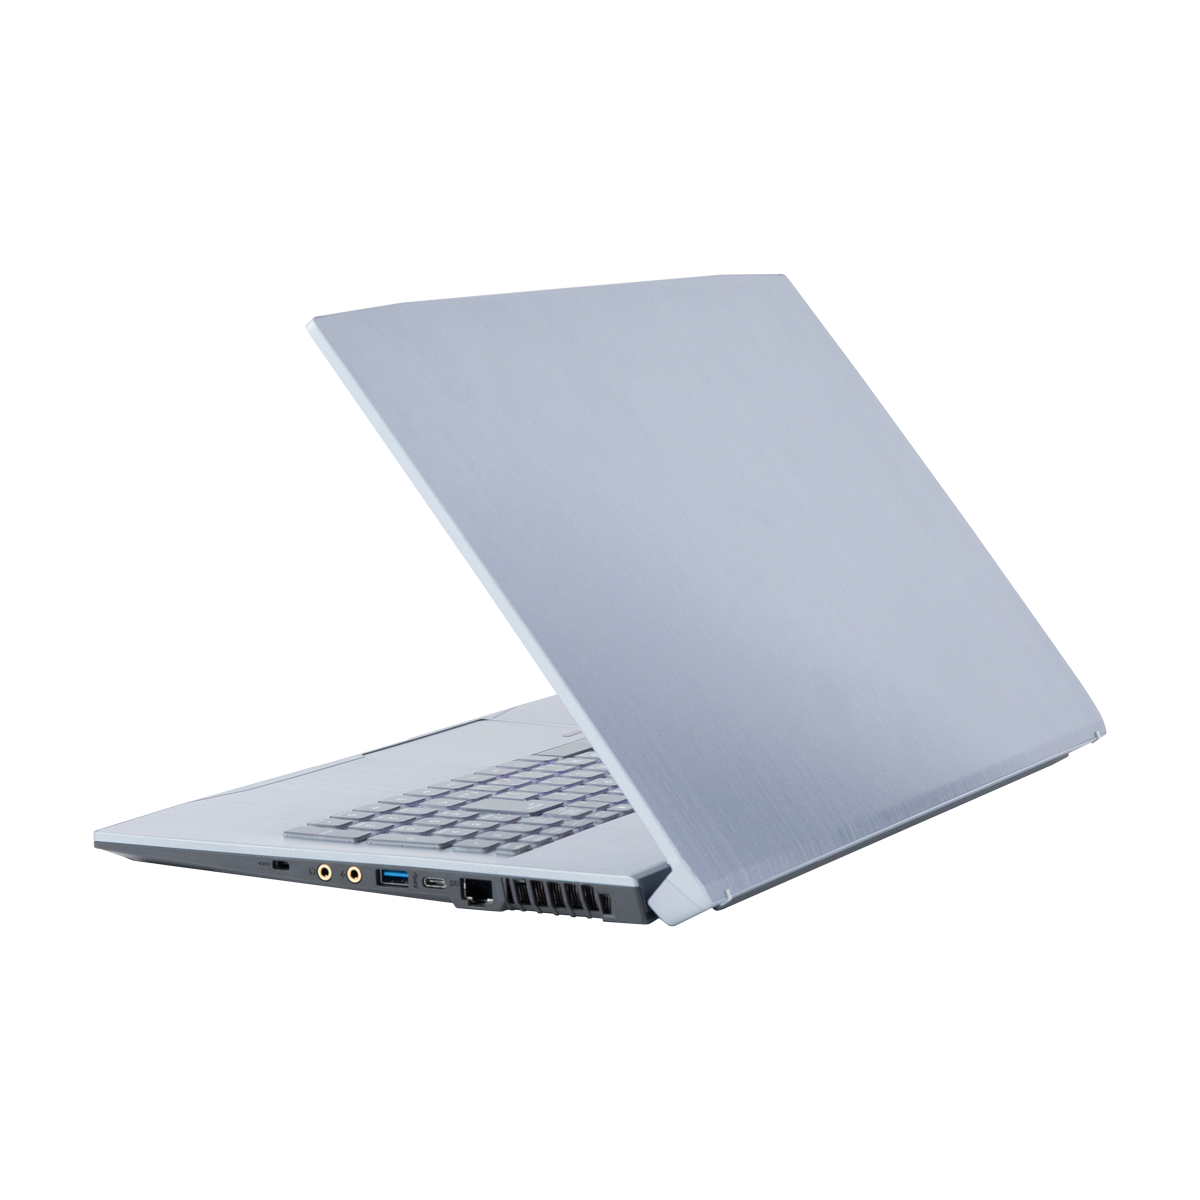 ELSA VELUGA 3000 G2-17(Ubuntu版)17.3インチ / Core i9 11980HK /QuadroRTX 3000 / メモリ 32GB / SSD 1TB /Ubuntu / ノートパソコン ELSA エルザ モバイルワークステーション ELVF33K9321TBHD3UR 【代引・日時指定・キャンセル不可・北海道沖縄離島配送不可】